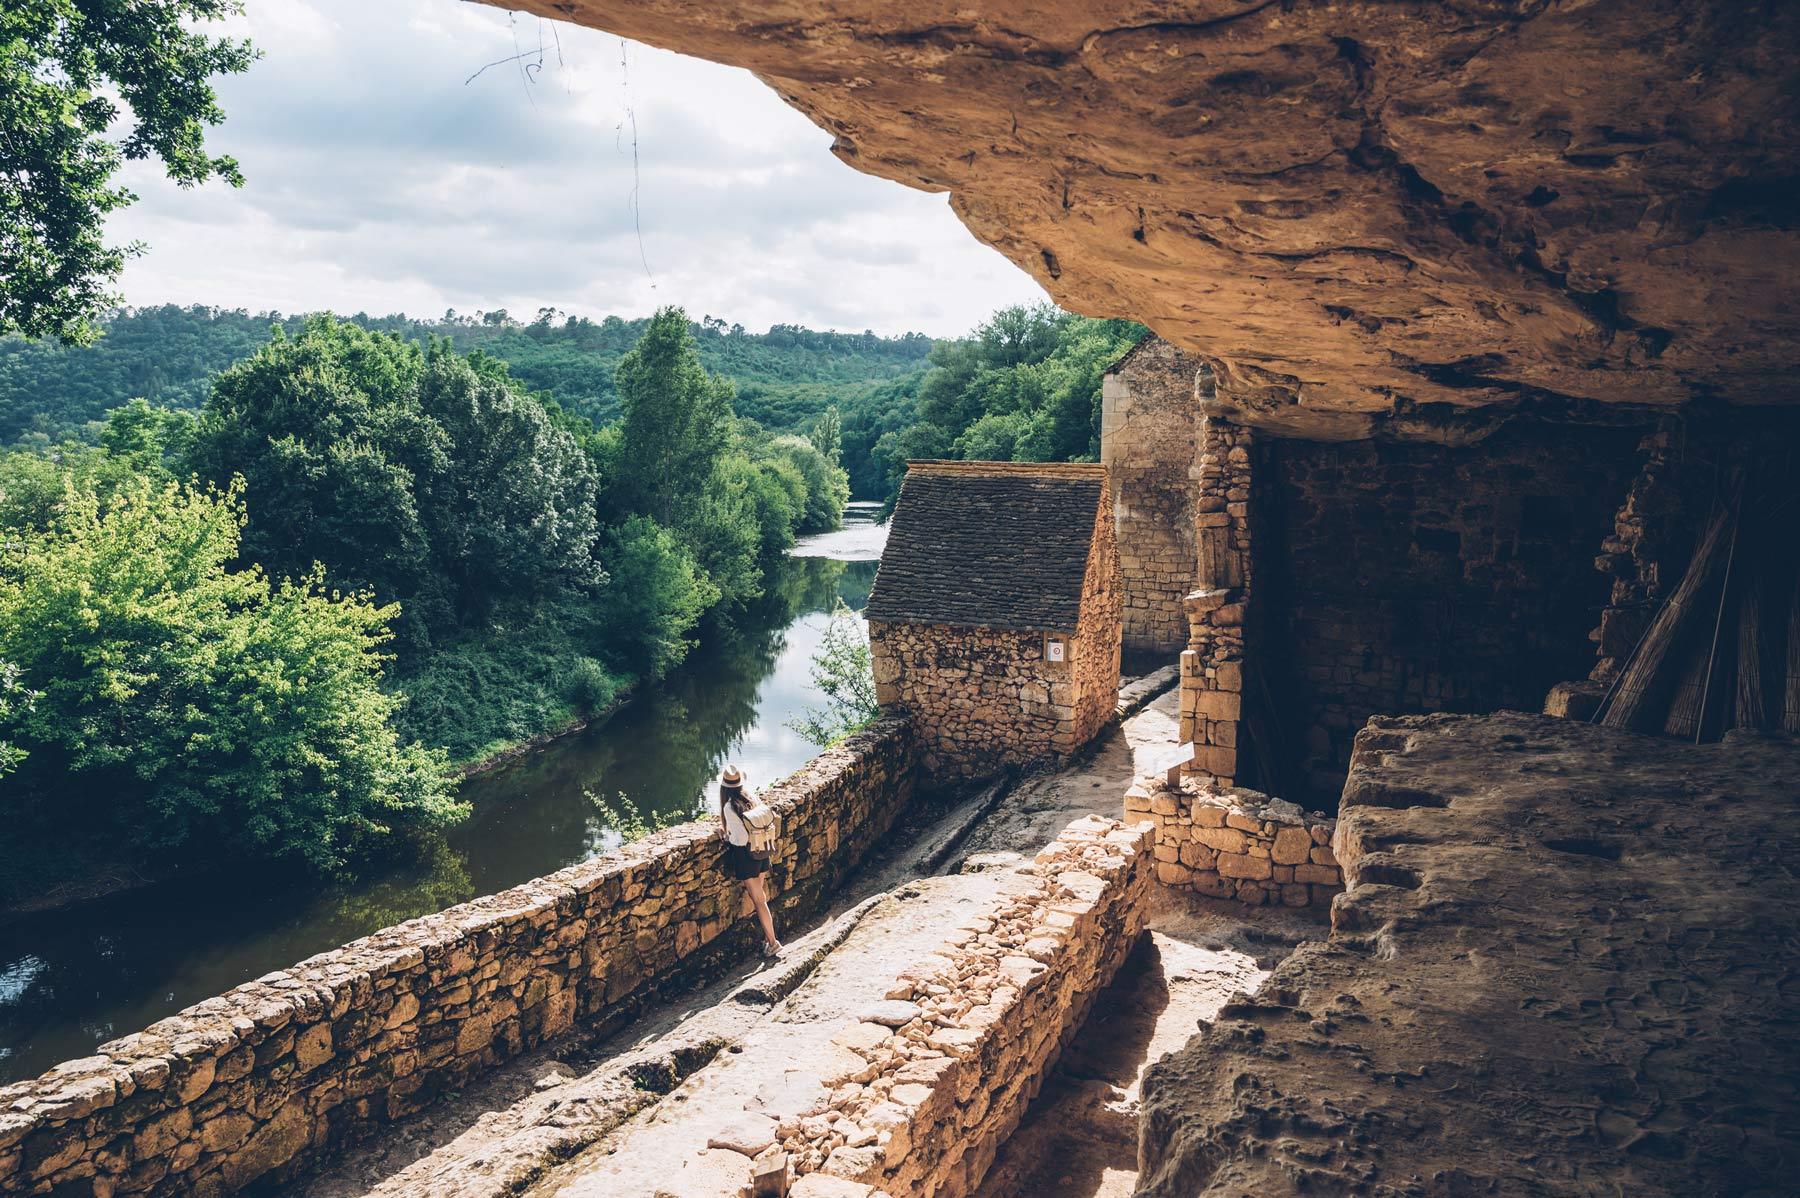 Le village troglodyte de la Madeleine, Dordogne